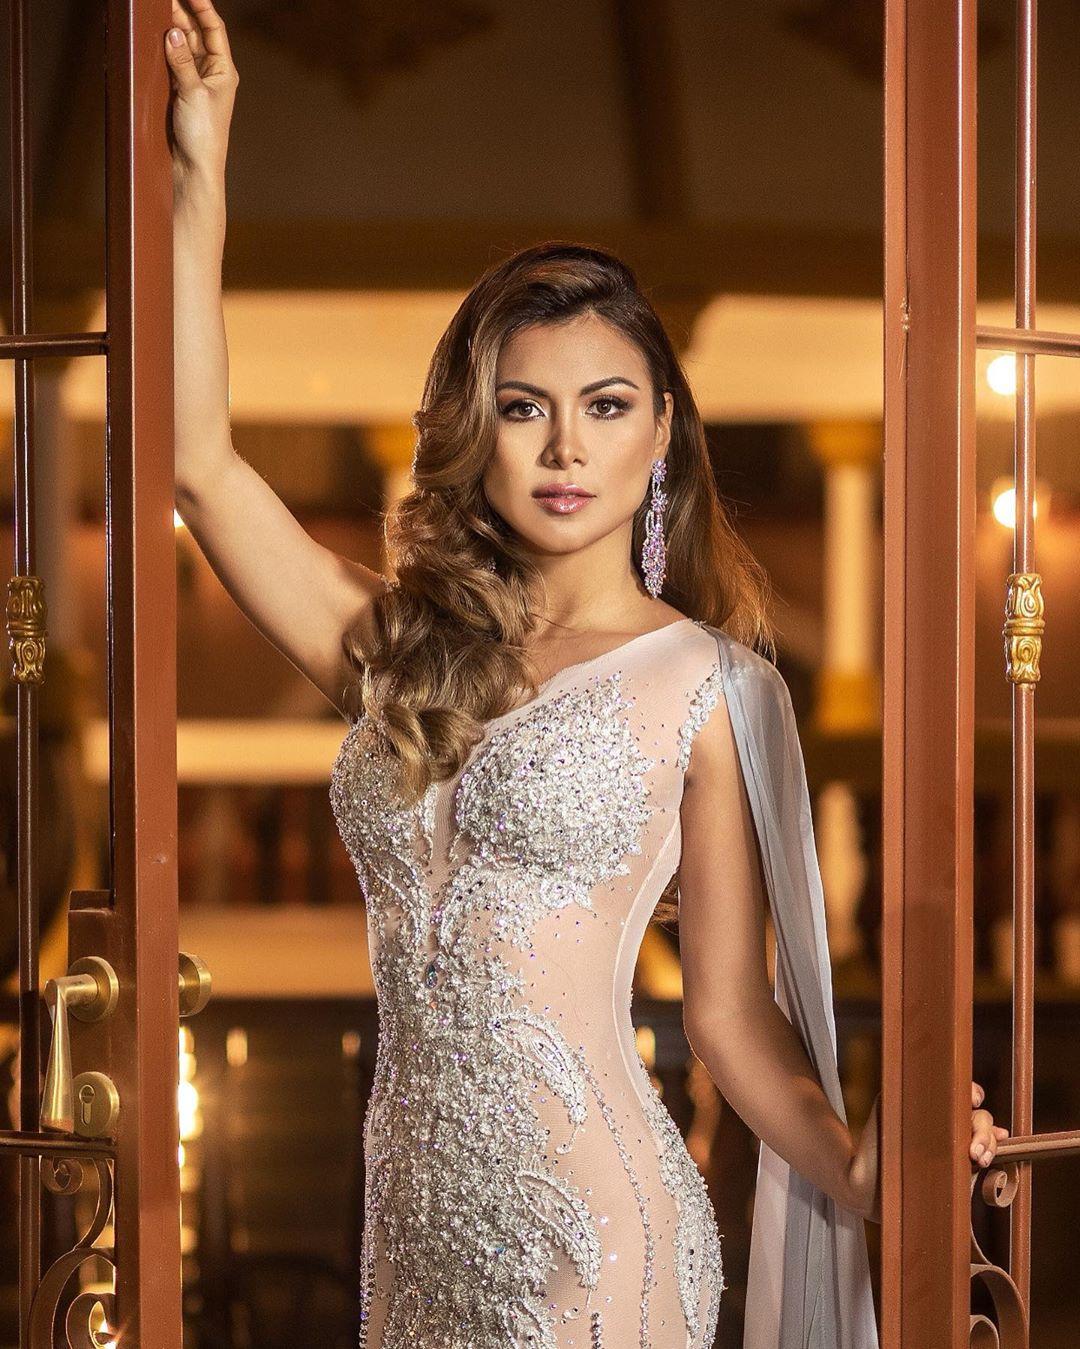 pierina melendez, miss hispanoamericana peru 2019. 73387319